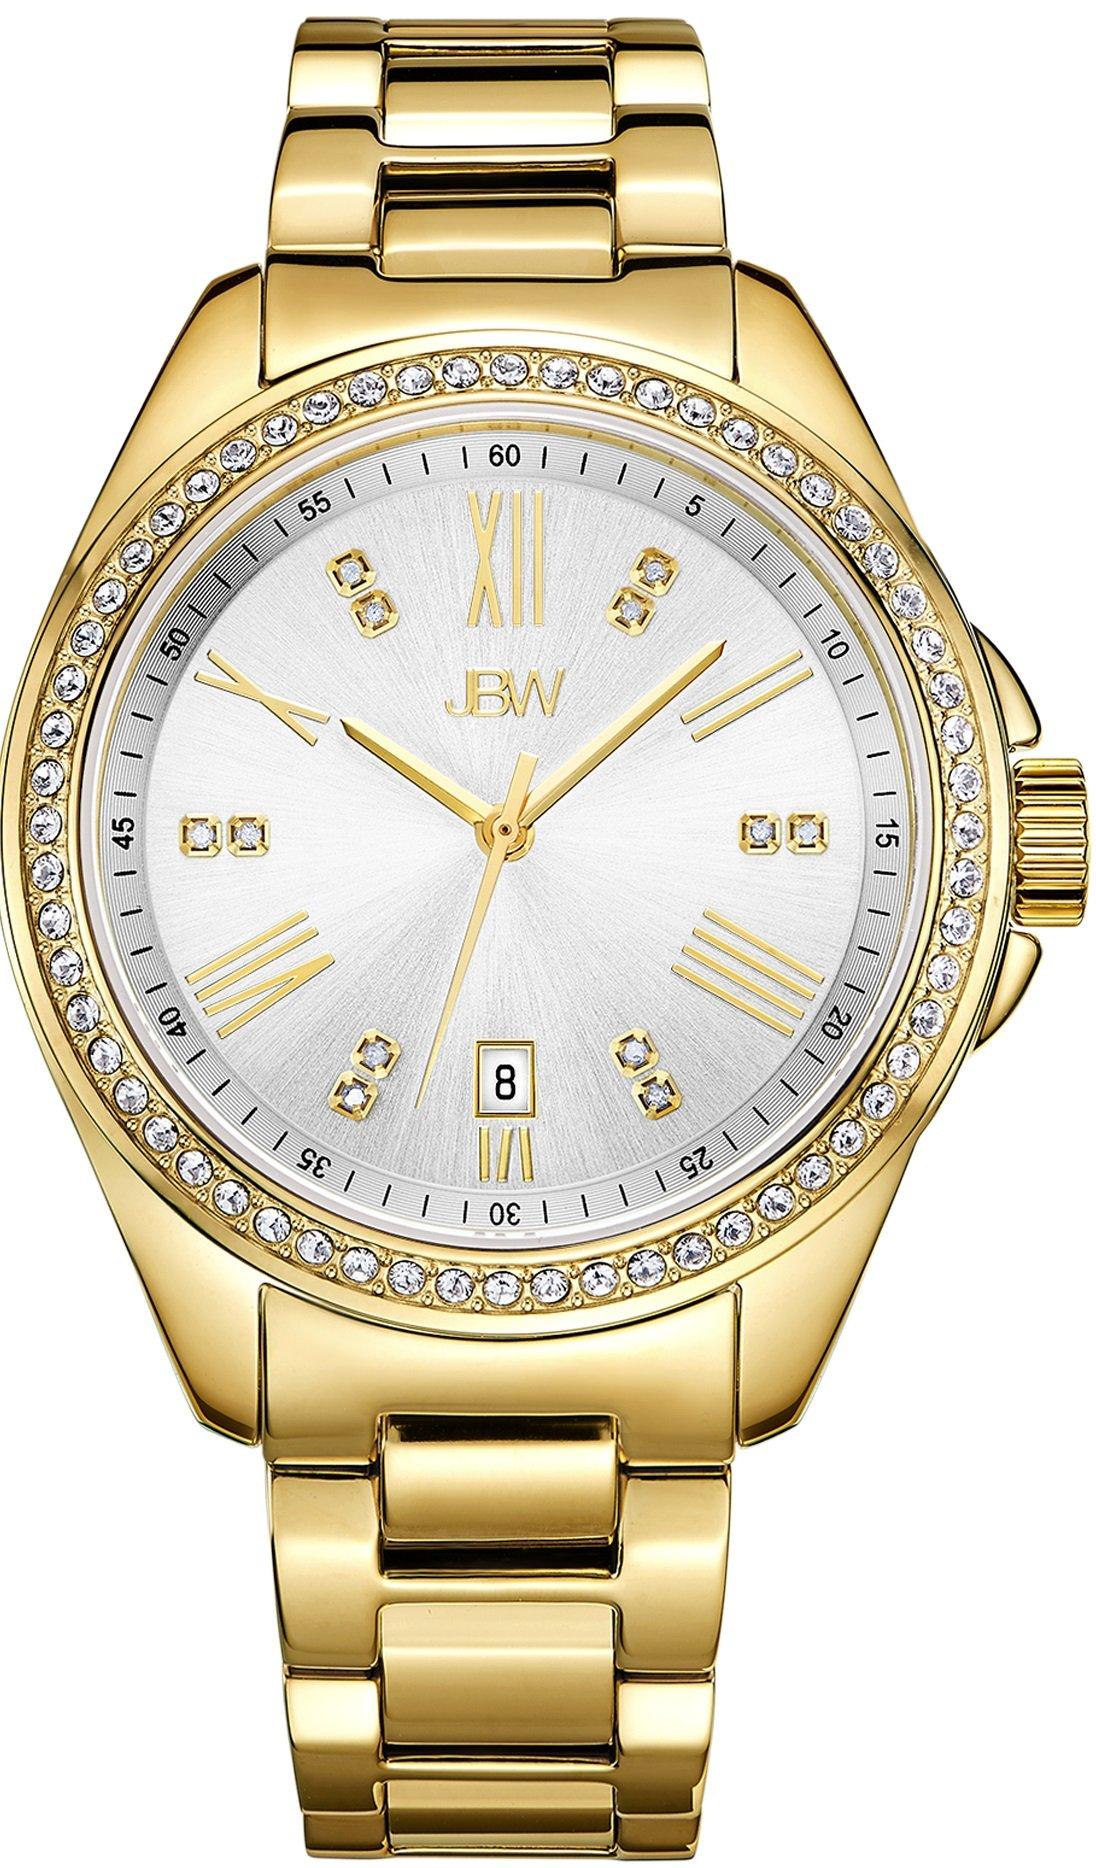 Jbw Women's Capri J6340B Gold Diamond Watch 6